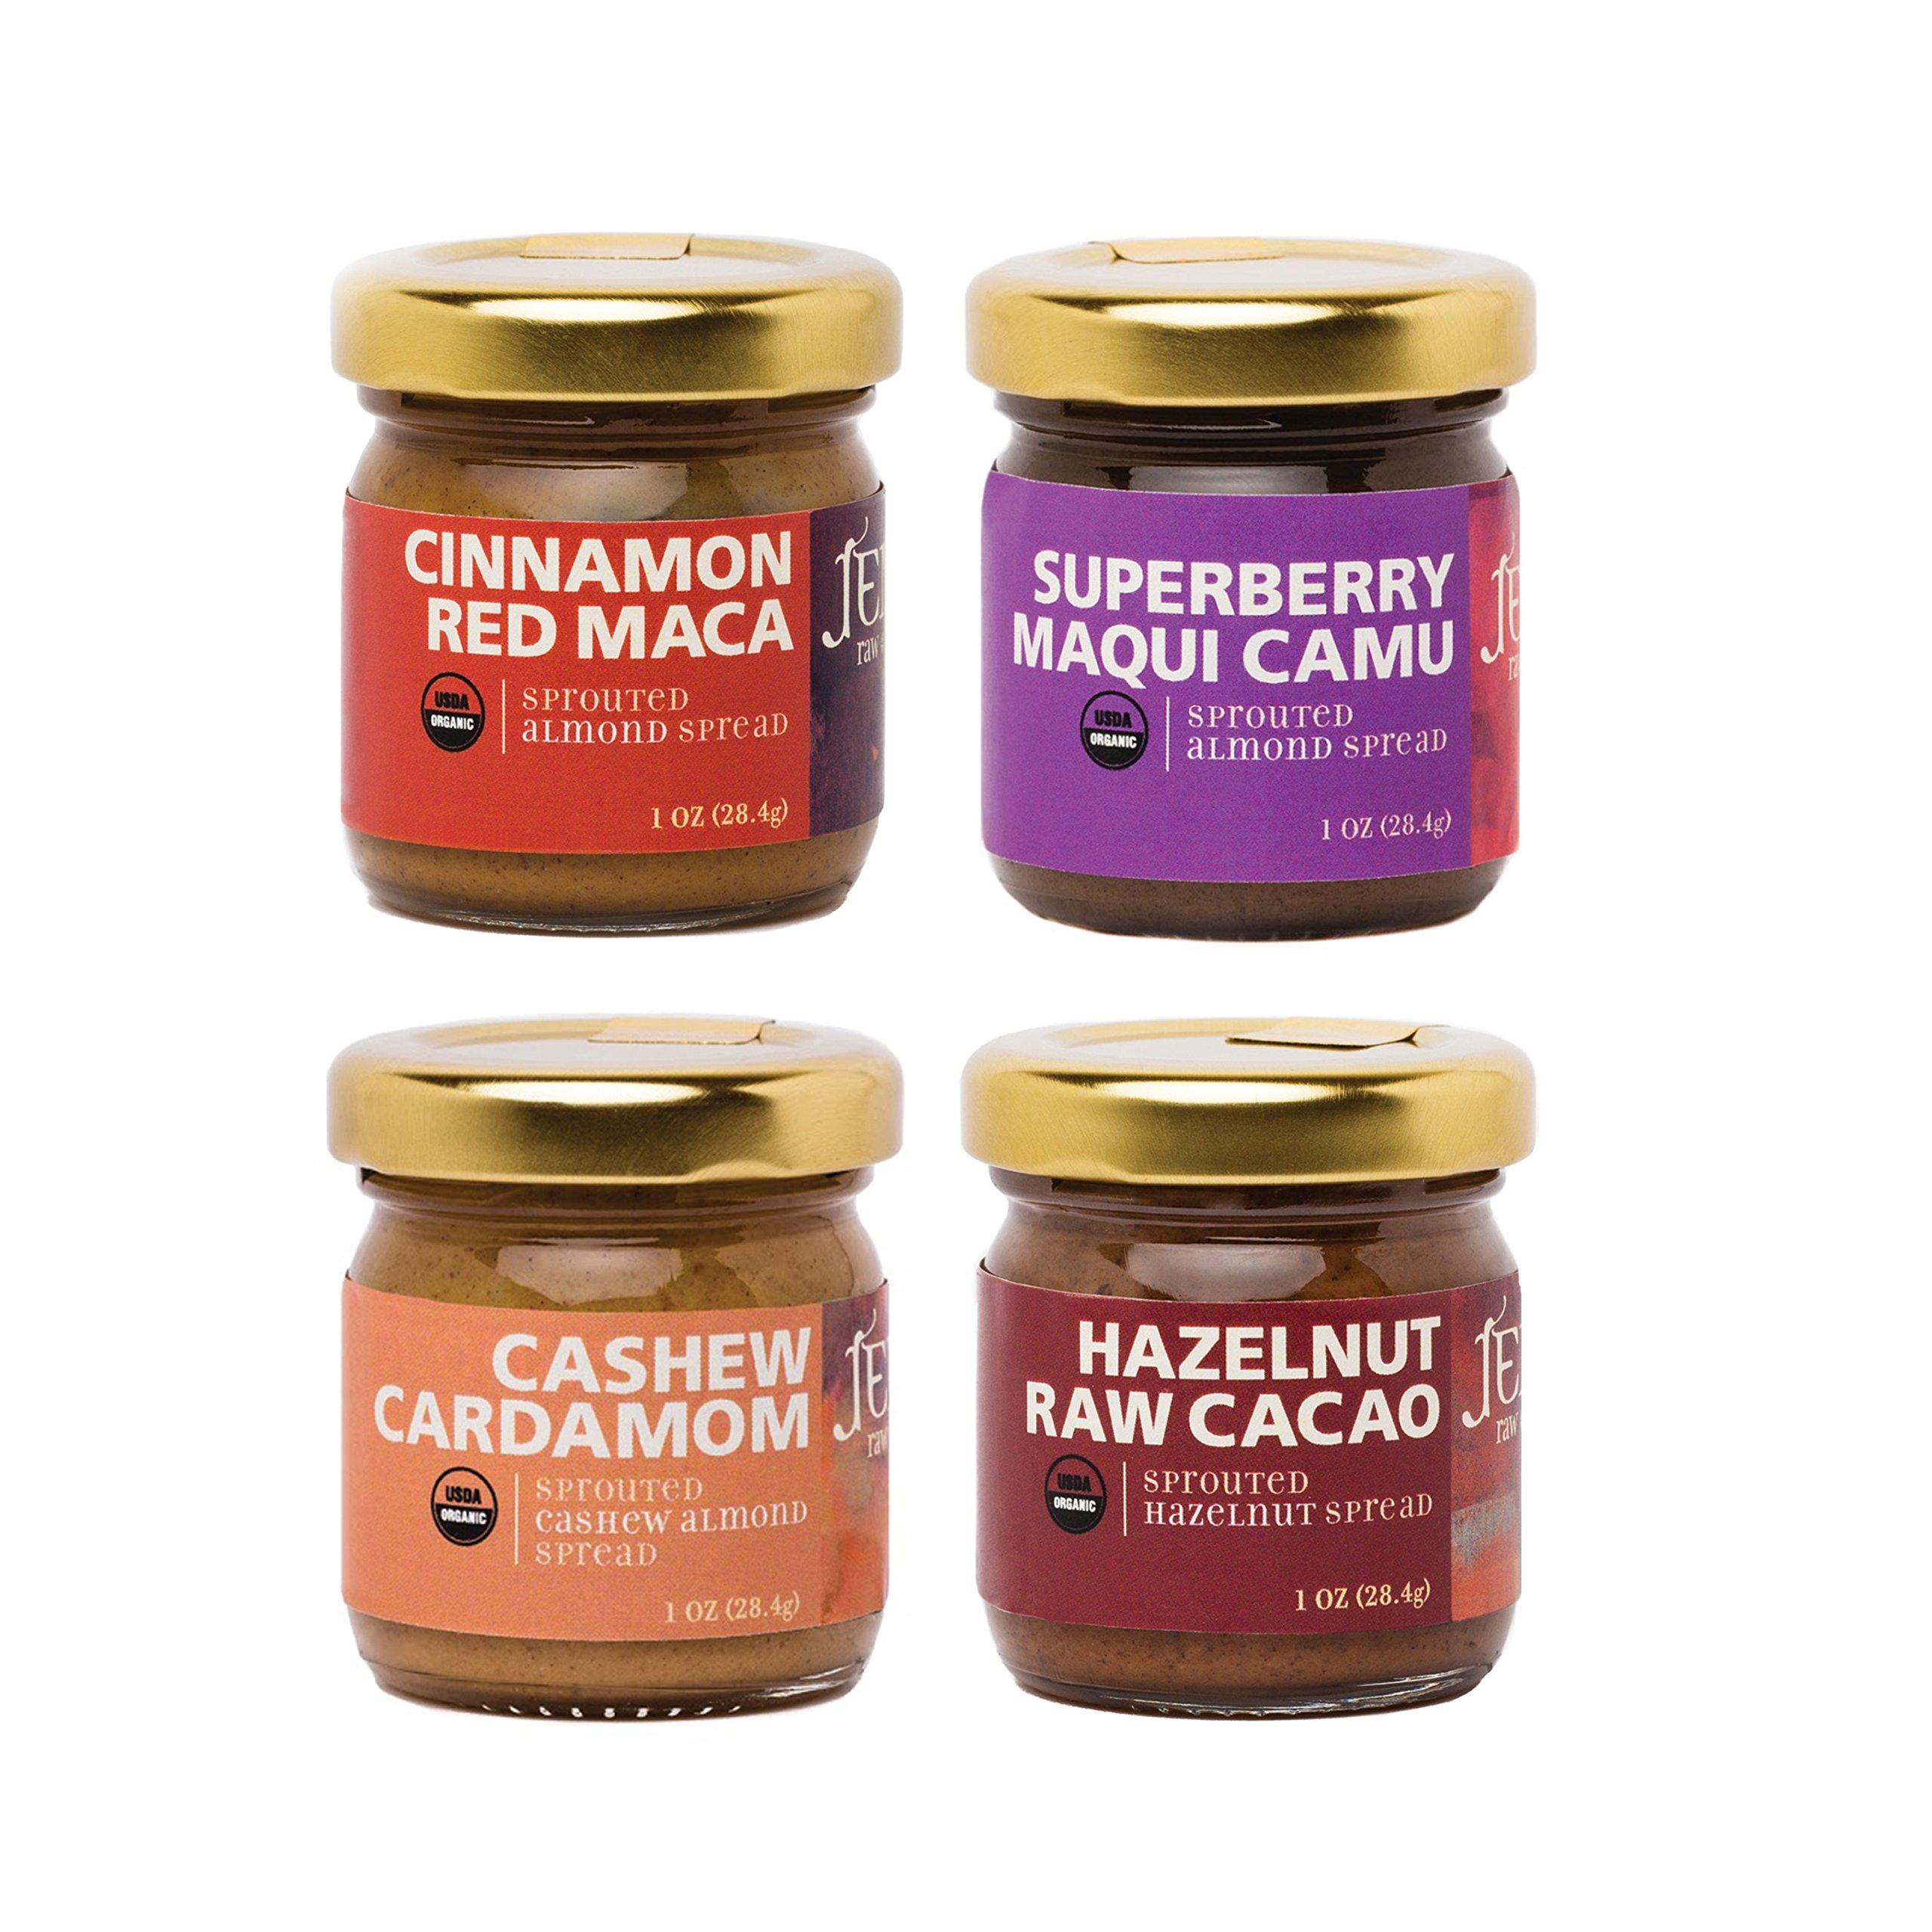 "Jem Raw, Vegan, Organic Specialty Nut Butter Spread ""Flight of JEM Raw"" Sampler Pack, 4 (1.25 oz) jars, flavors include Cashew Cardamom, Superberry Maqui Camu, Chocolate Hazelnut and Cinnamon Red Maca"